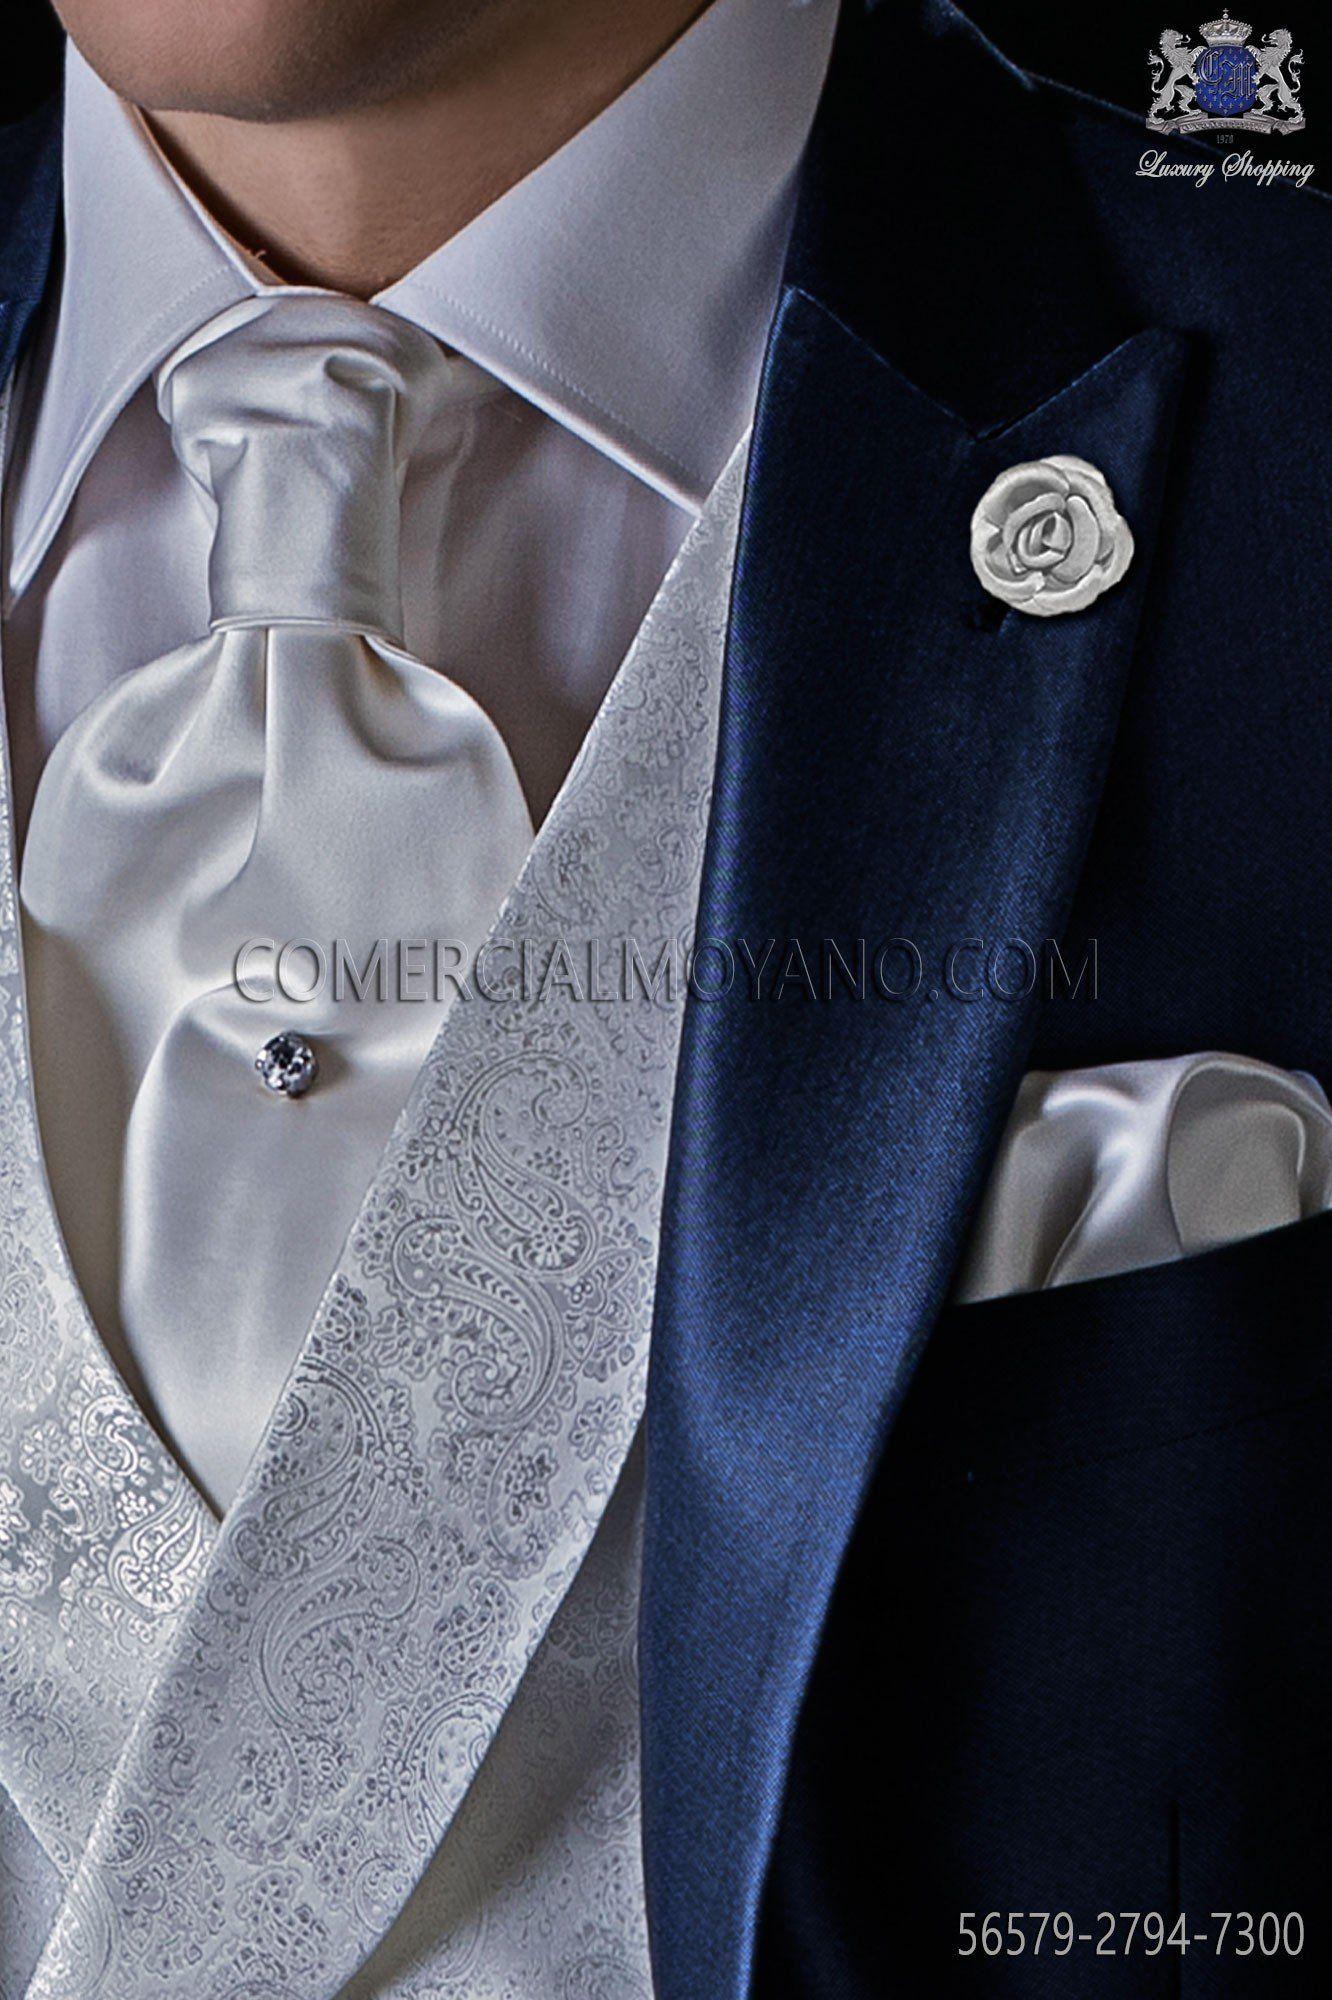 diseño hábil baratas realmente cómodo Corbatón con pañuelo a juego gris perla raso mixto seda en ...